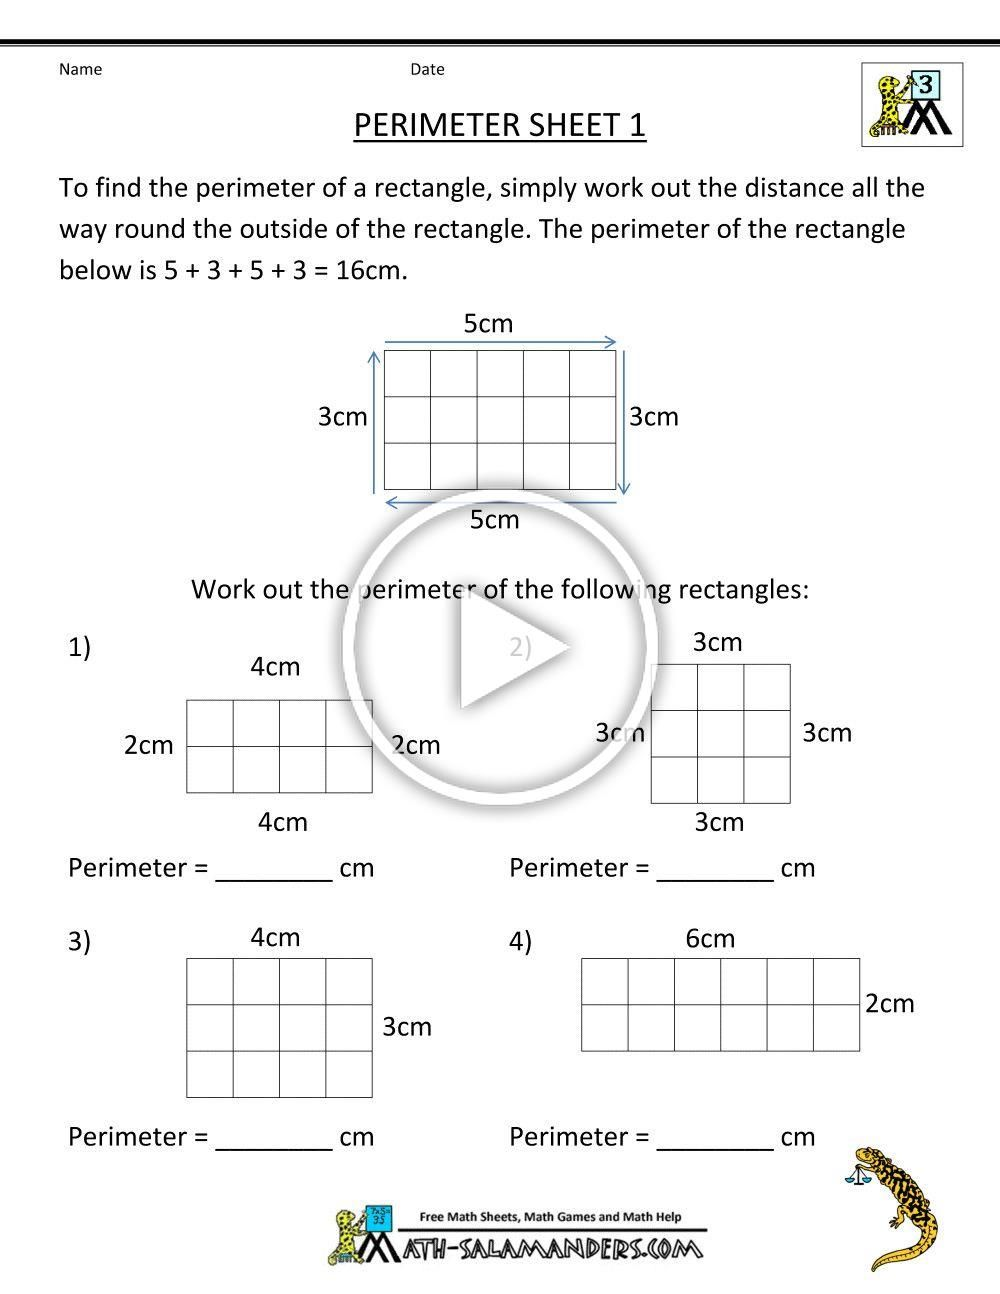 medium resolution of 2 Capacity Worksheets Grade 2 free 3rd grade math worksheets perimeter 1 √  Capacity Worksheets Grade 2 . 2 Capacity Worksheets Grade 2 . Inches  Measurement Work… in 2020